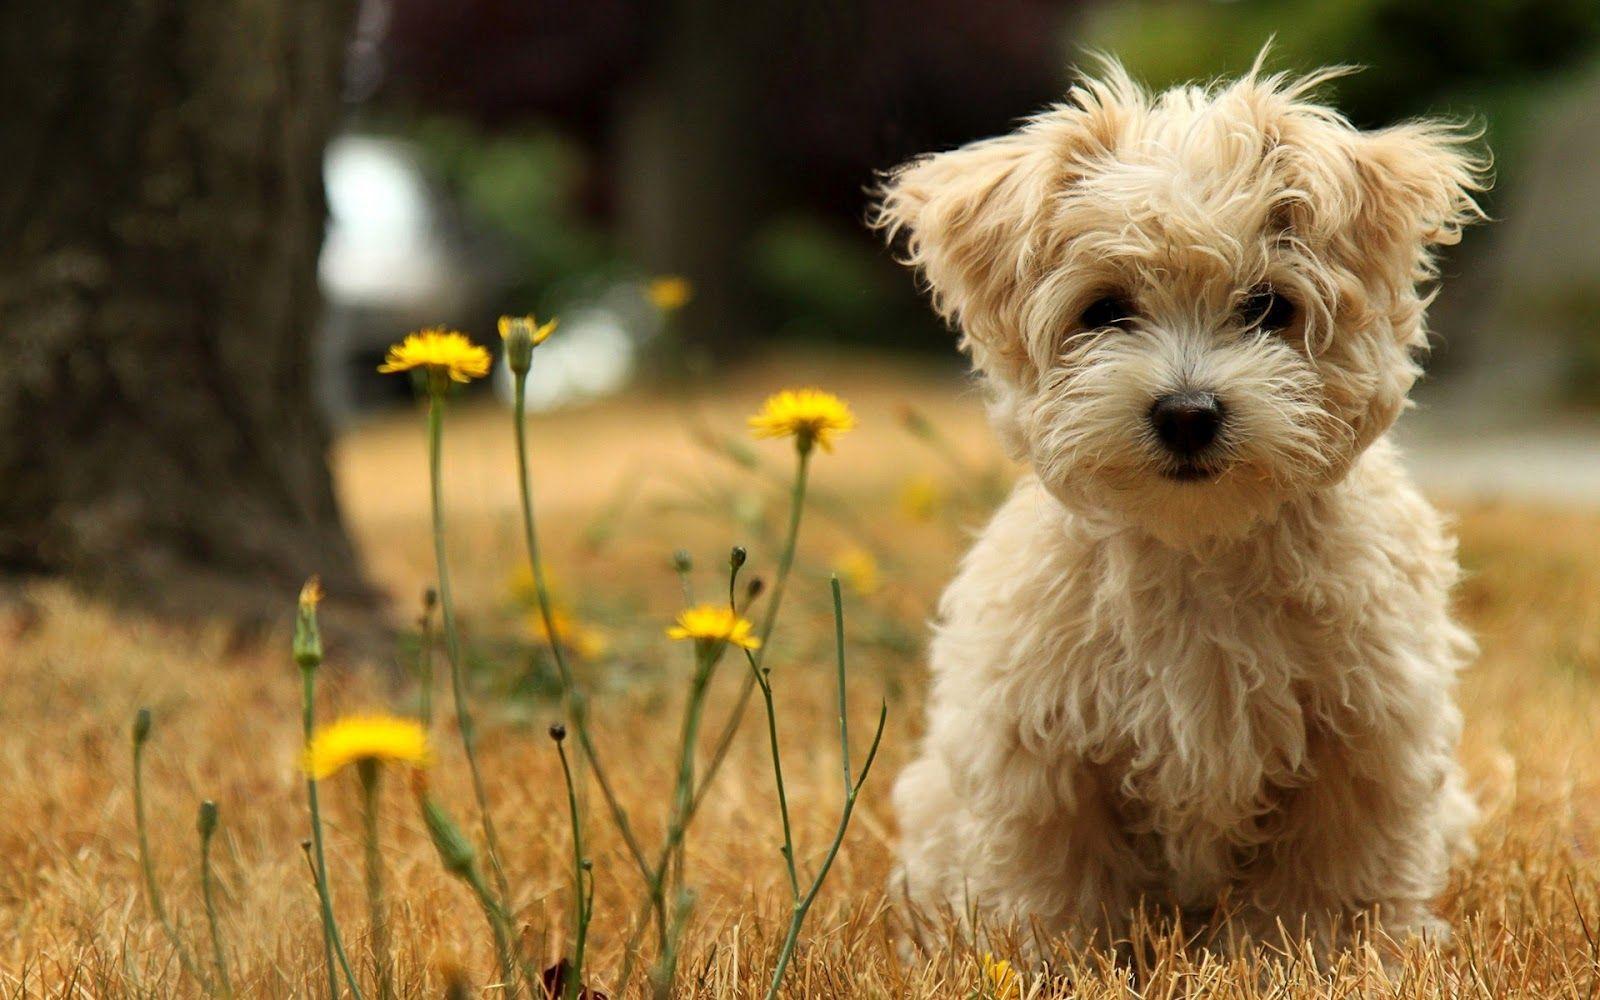 Pin By Allison Broadwater On Lovely Bear Dog Breed Cute Puppy Wallpaper Teddy Bear Dog